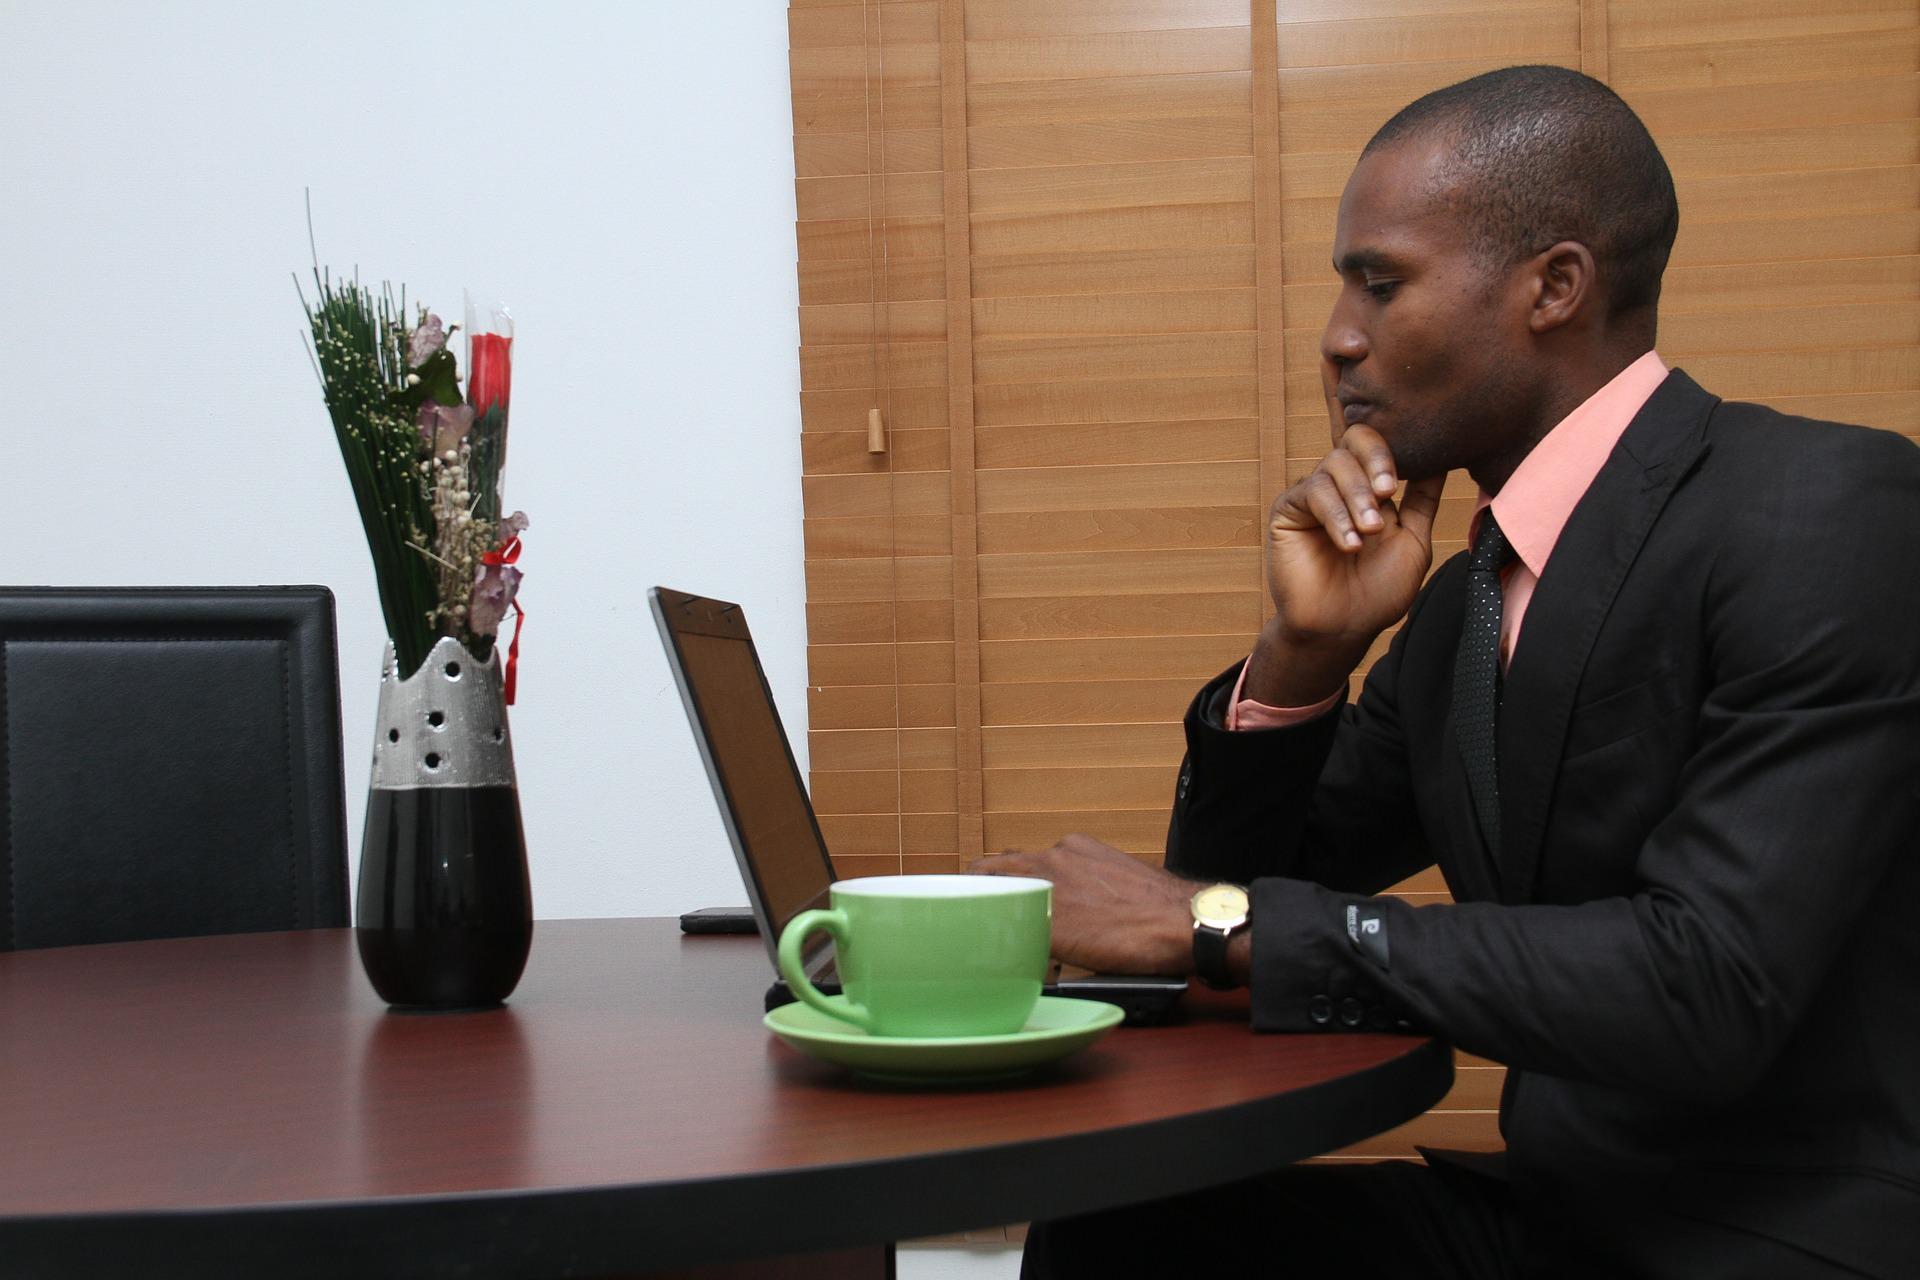 DevTel Employee On His Laptop